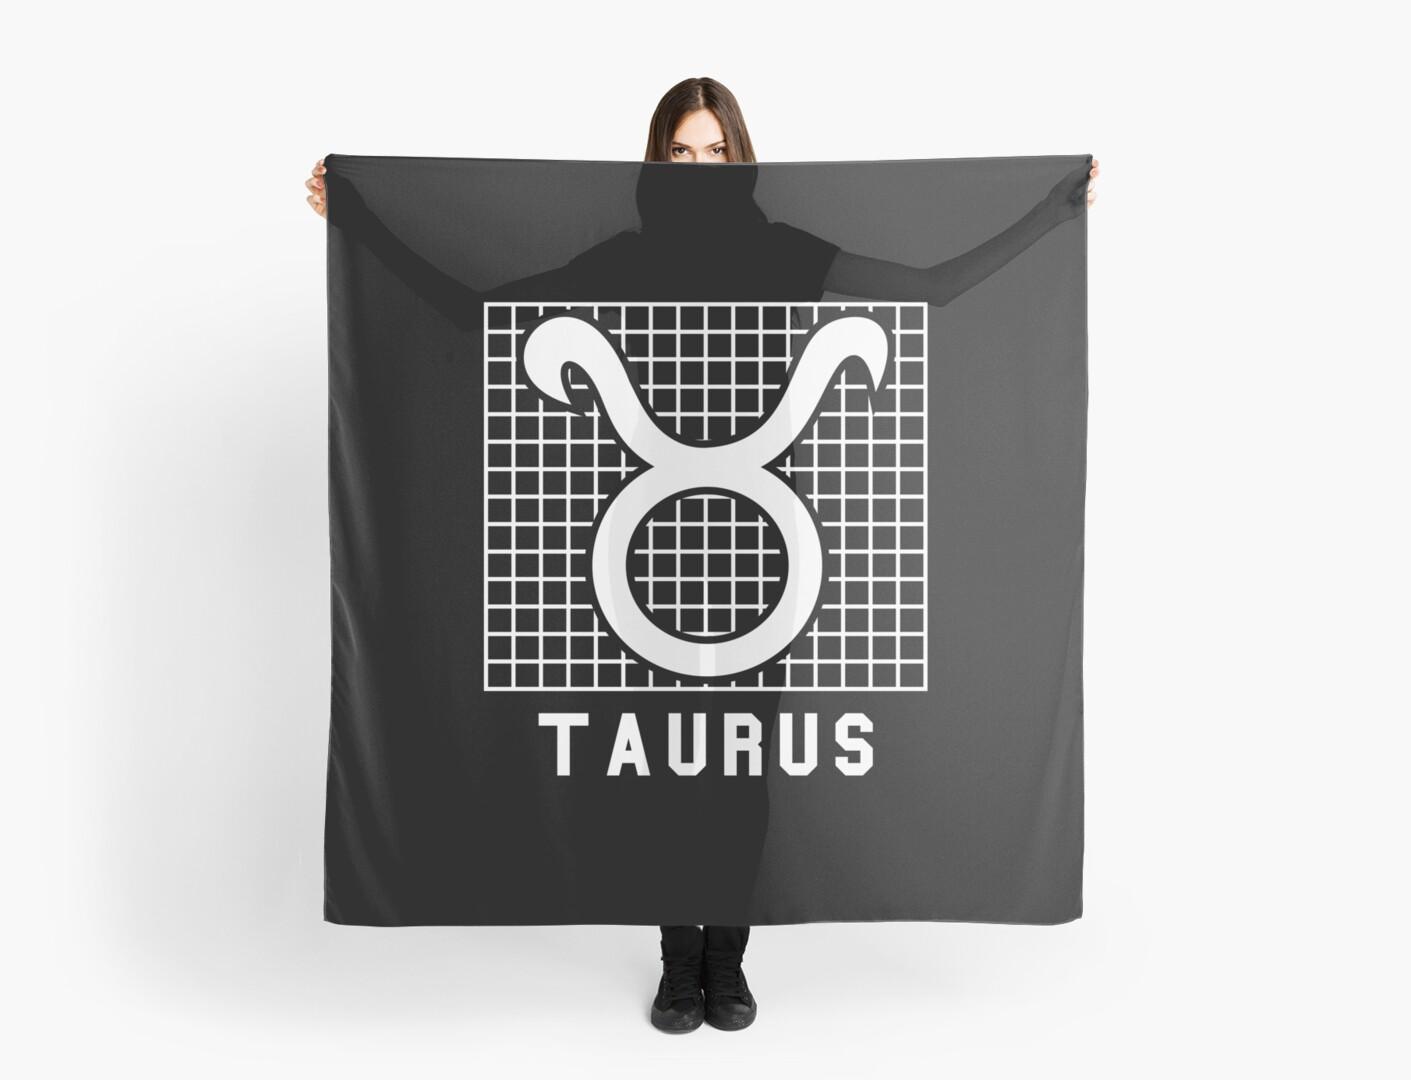 Taurus Zodiac Sign Print Scarves By Mistergoodiez Redbubble